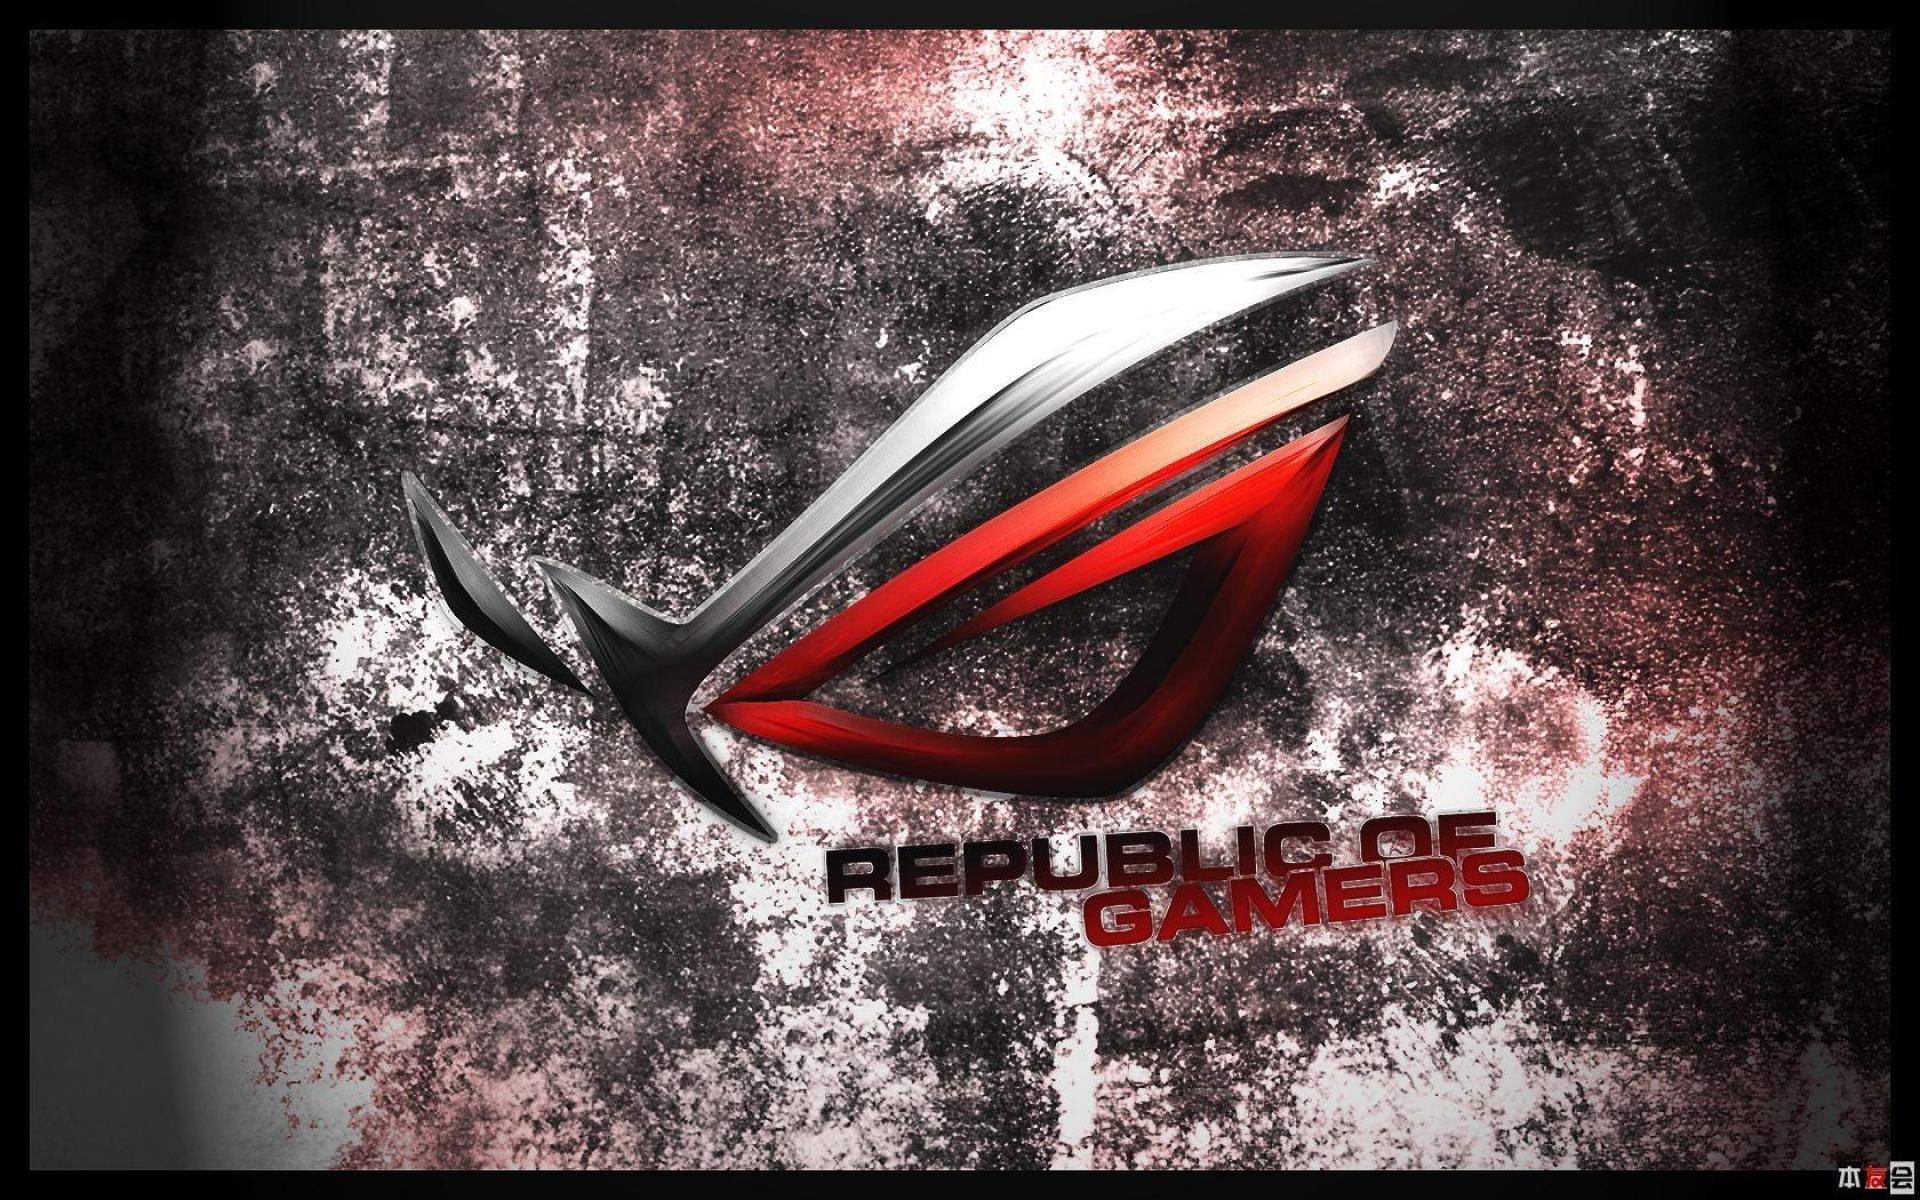 Republic of gamers rog wallpapers hd for desktop backgrounds - Rog desktop wallpaper ...